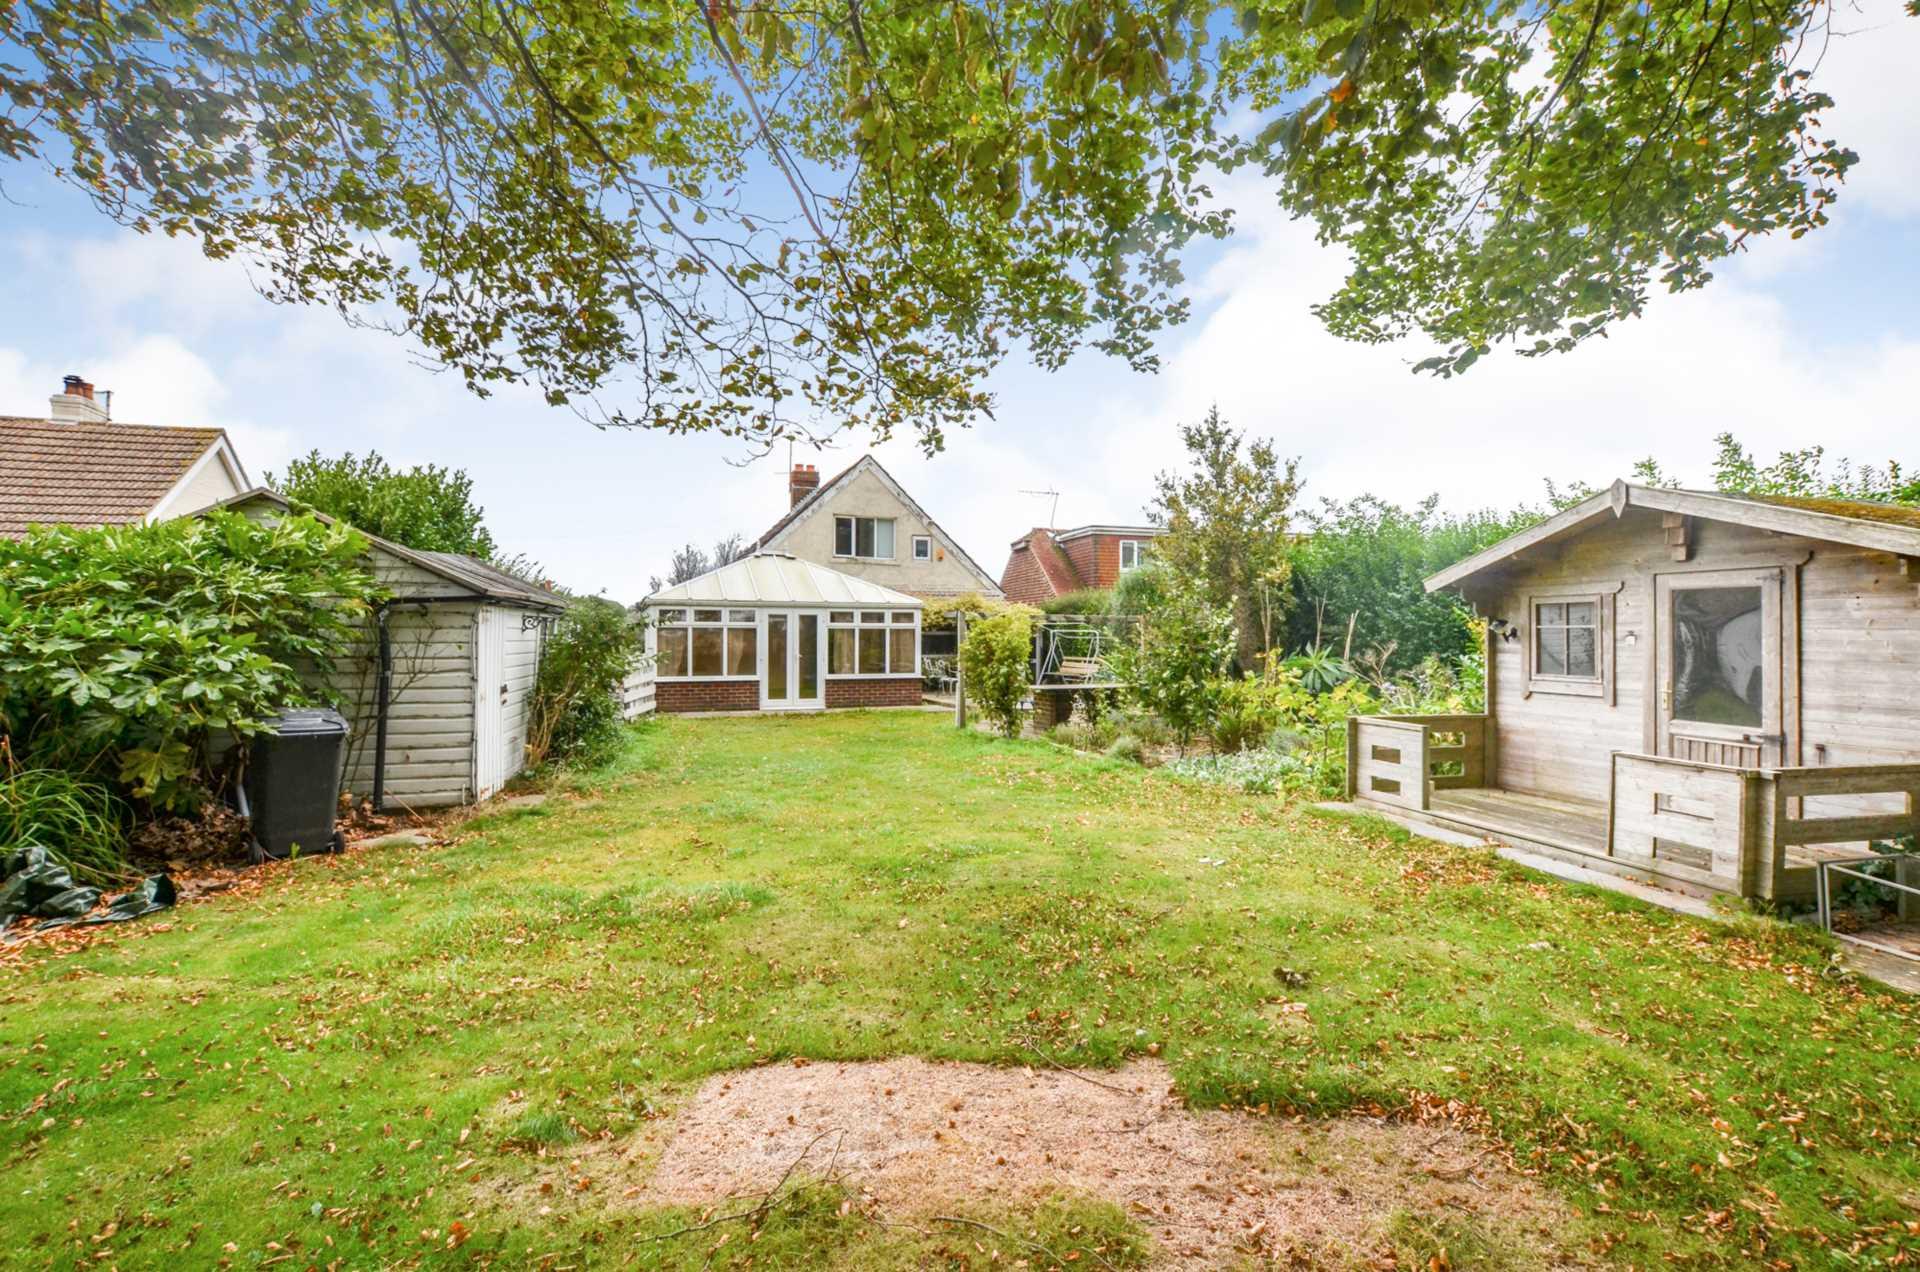 Birdham Road, Donnington, Chichester, Image 13